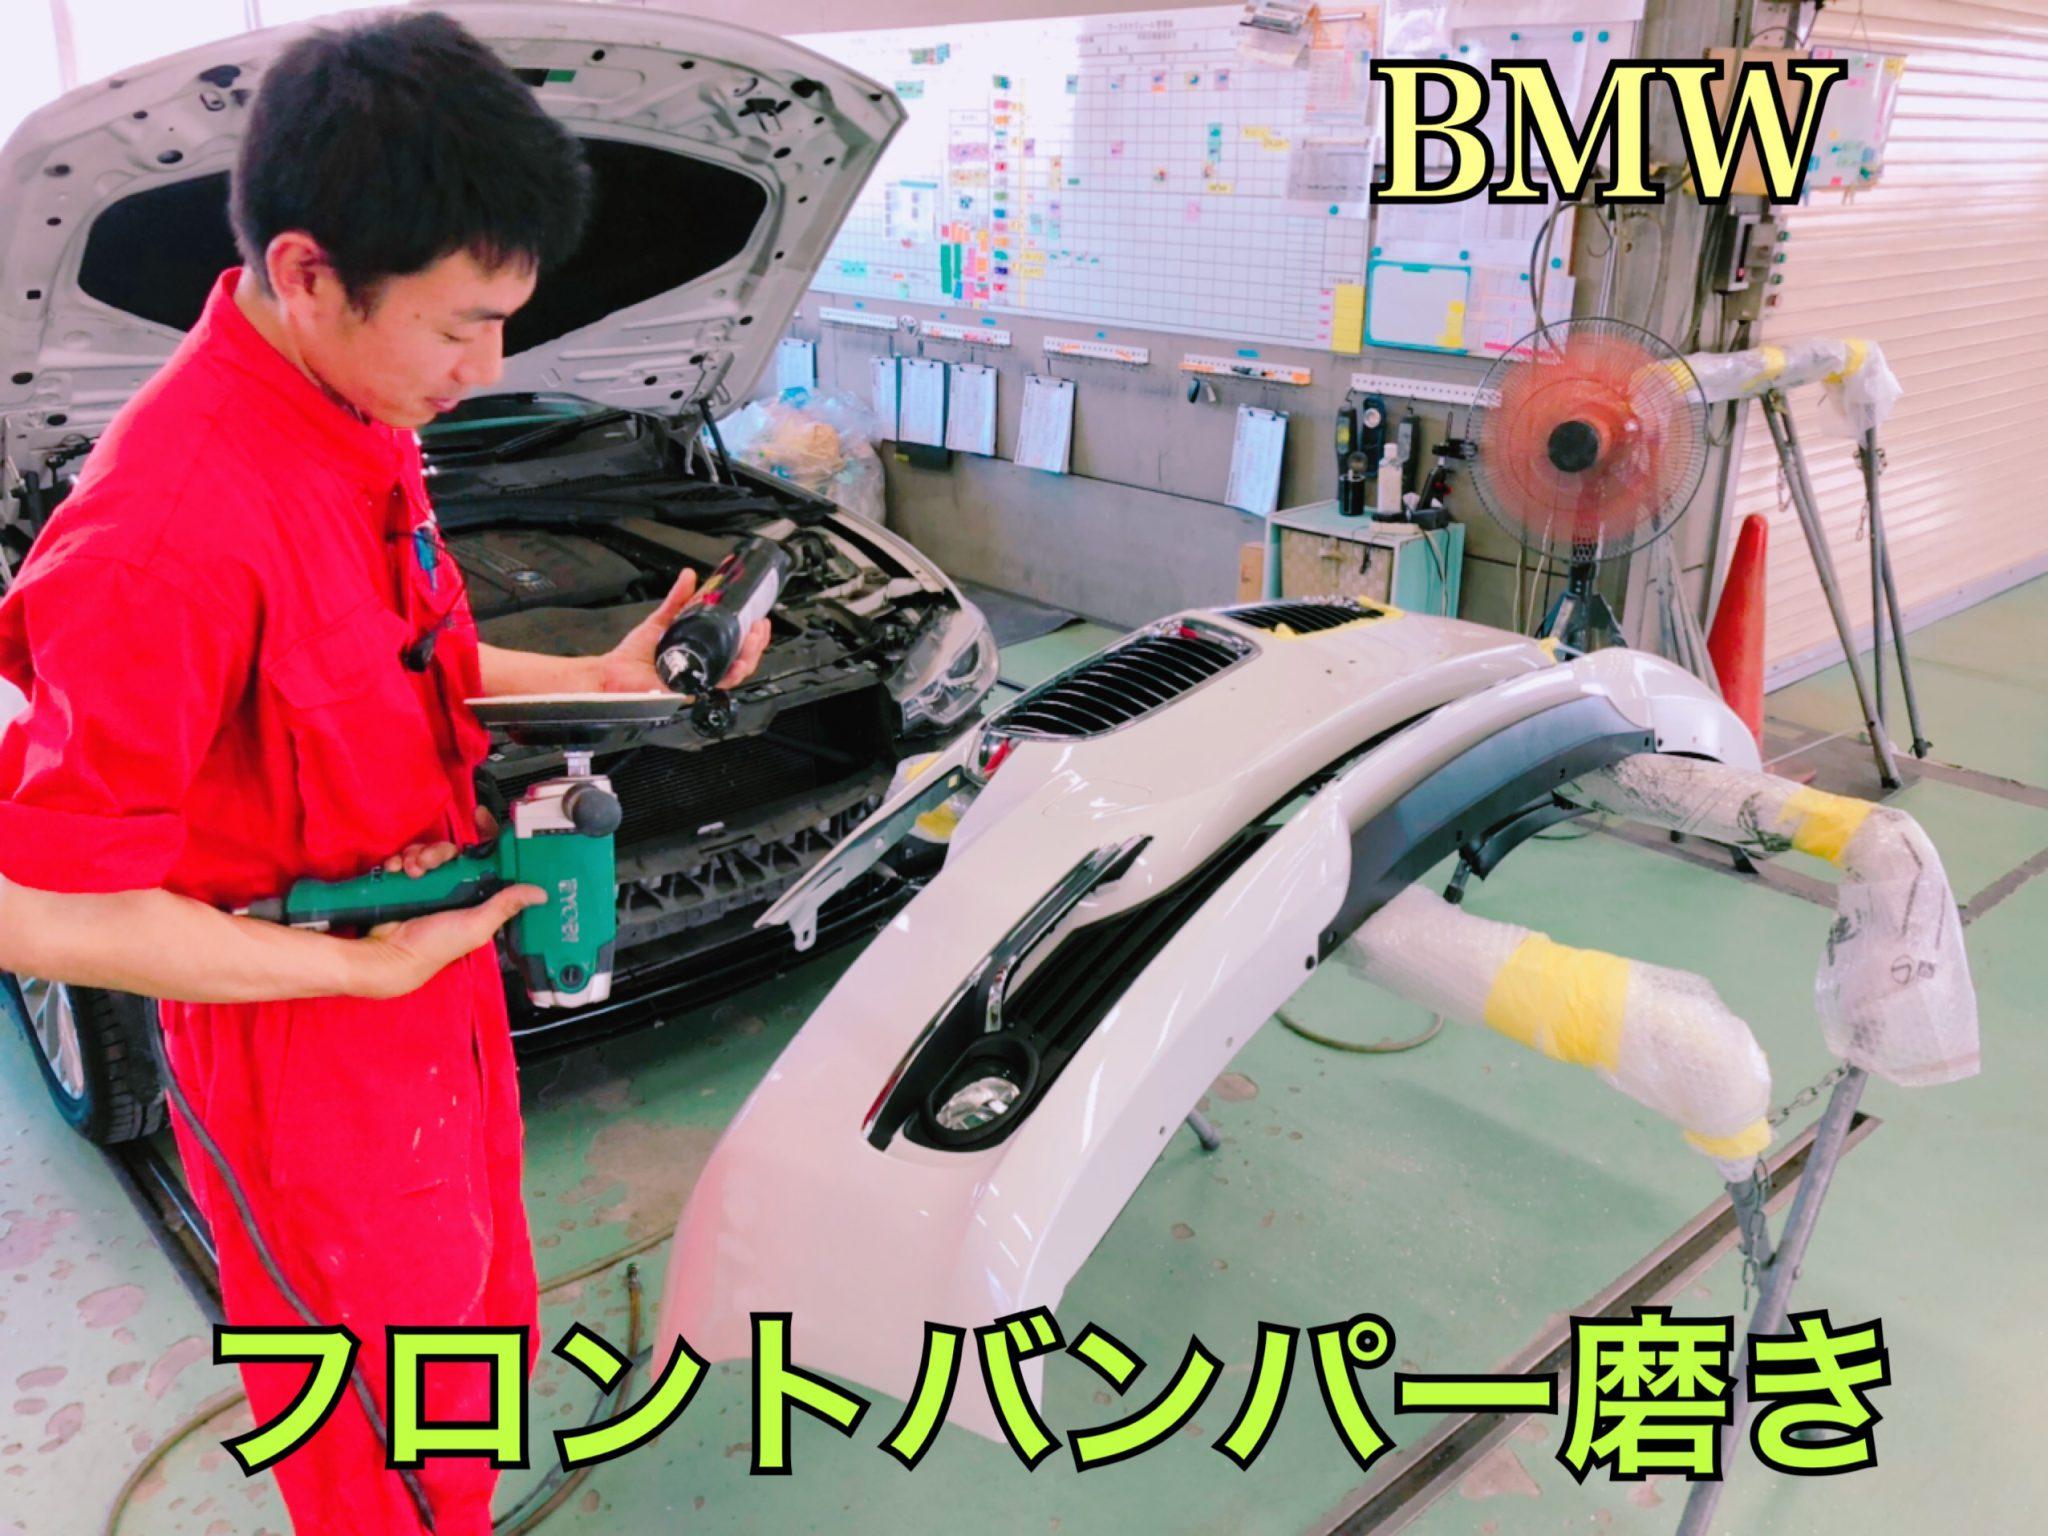 BMW フロントバンパー キズ修理